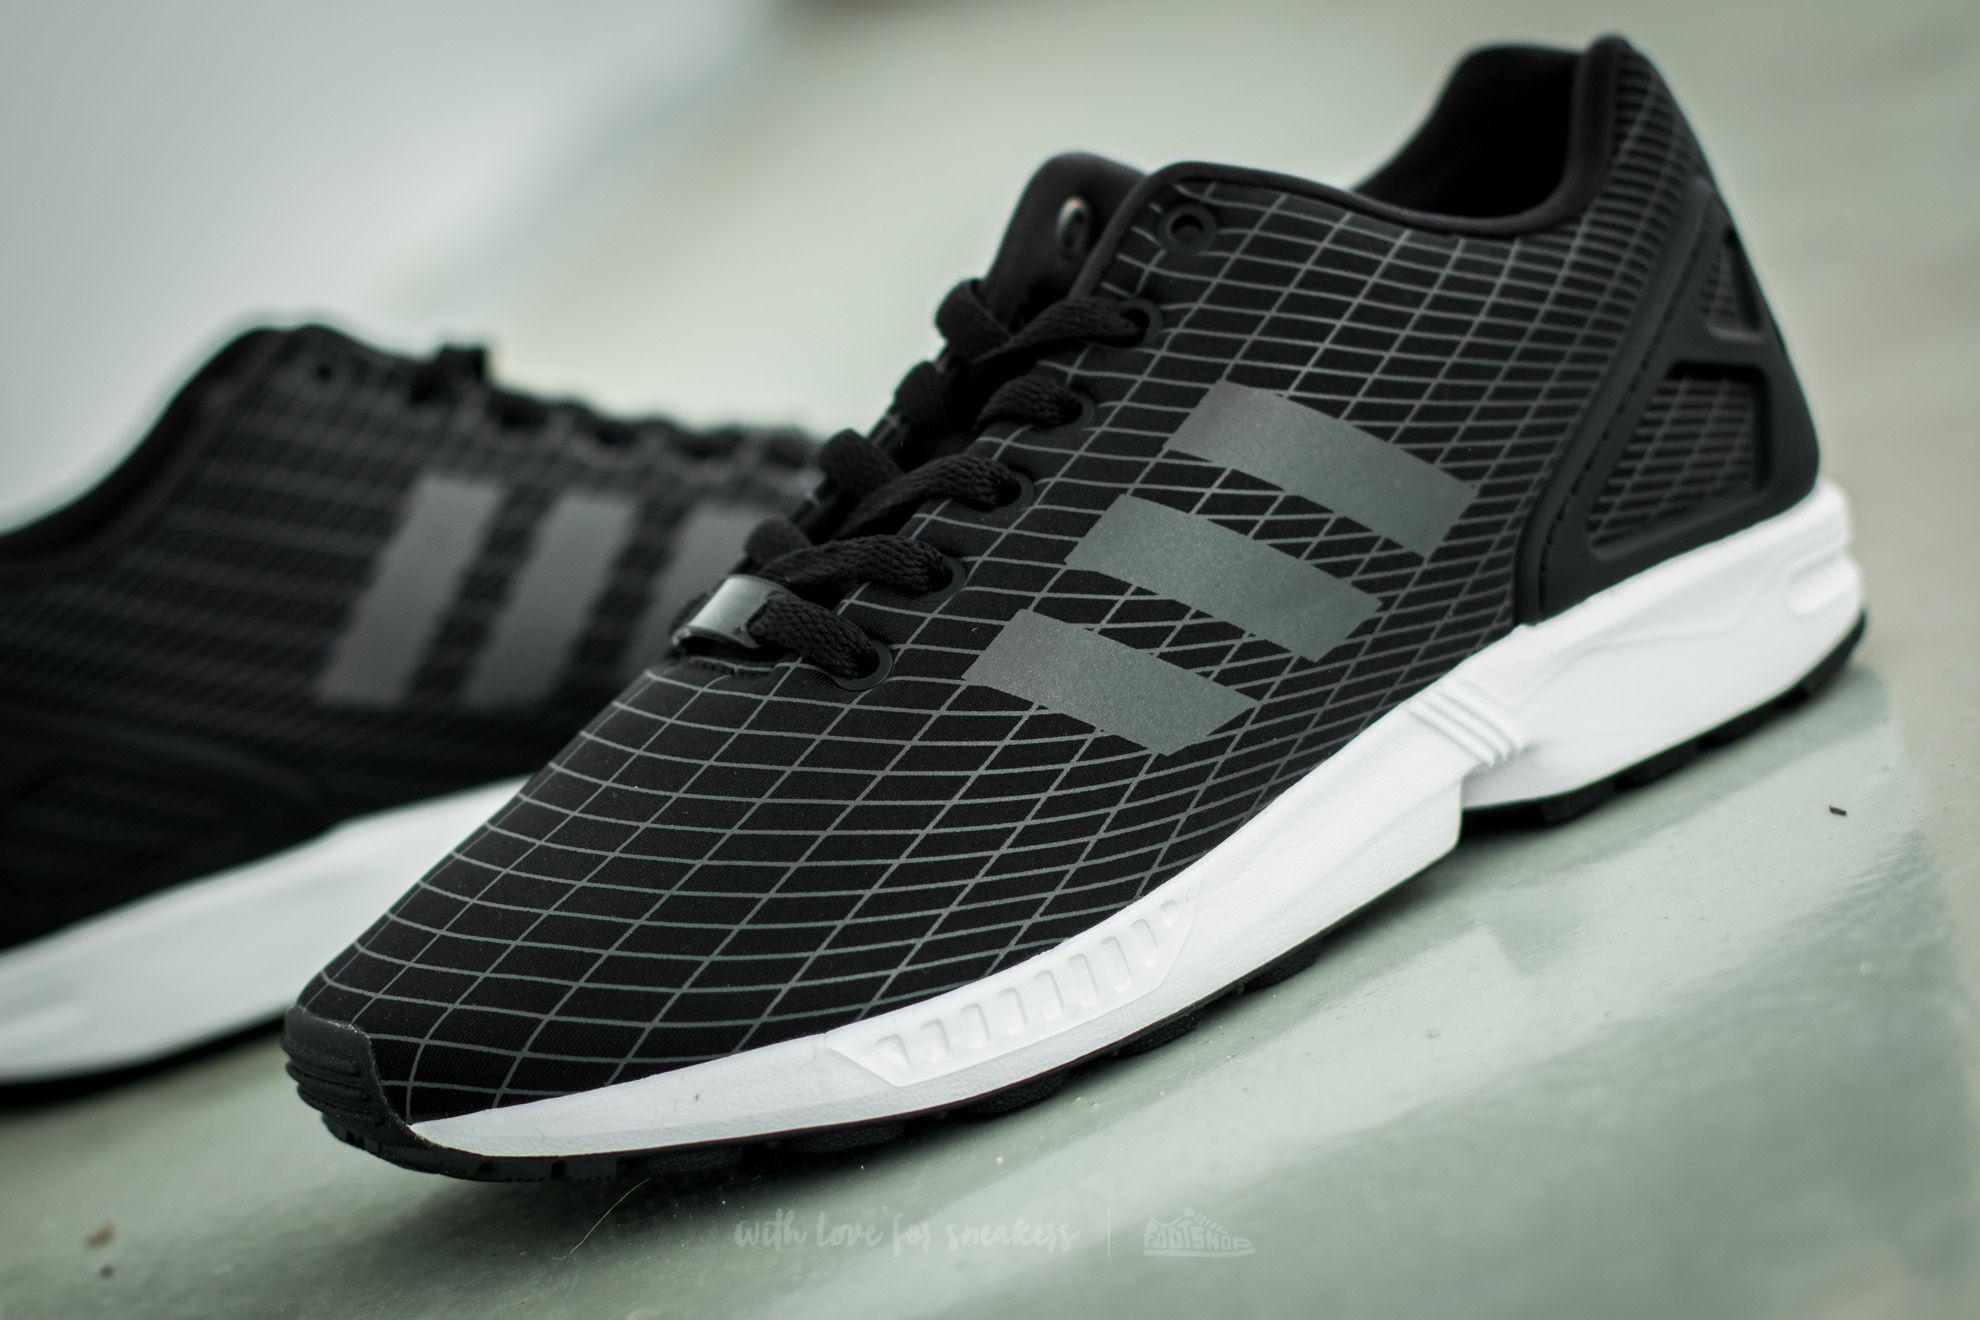 Lyst adidas Originals adidas zx Flux Core Negro / blanco / núcleo FTW